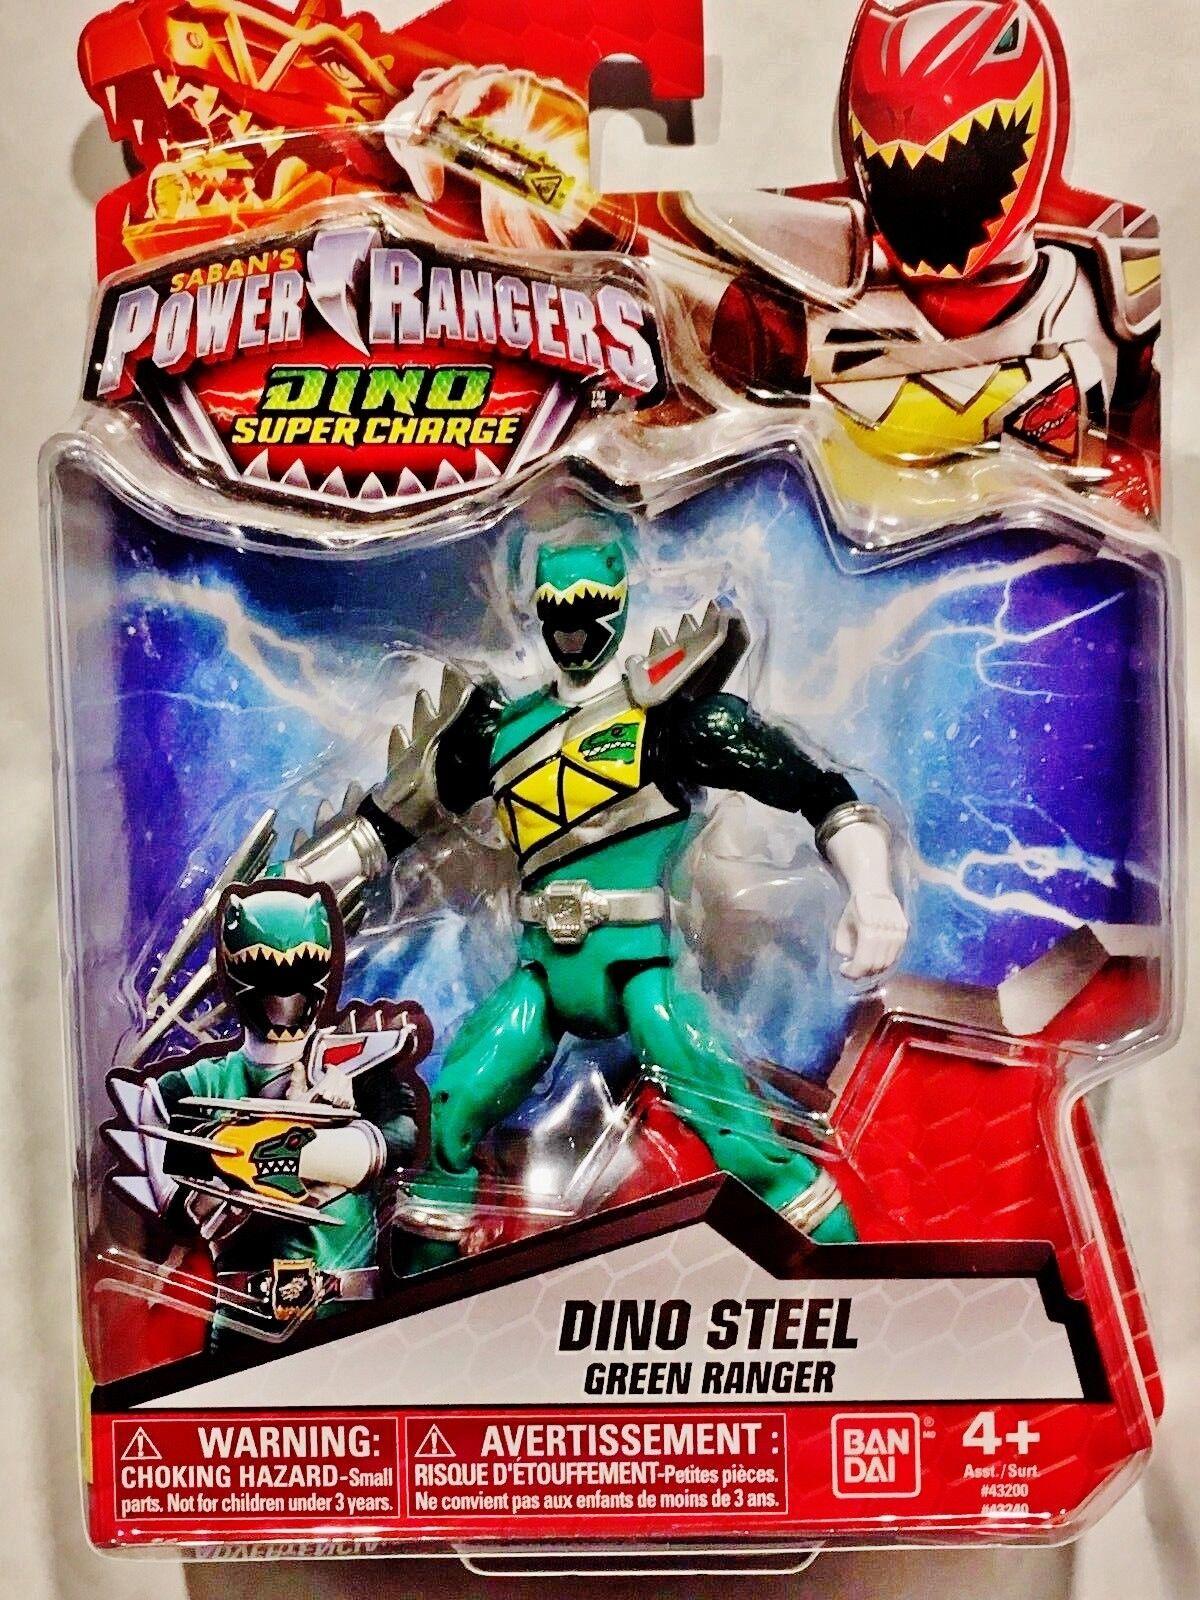 Power Rangers Dino Super Charge - Dino Steel Green Ranger